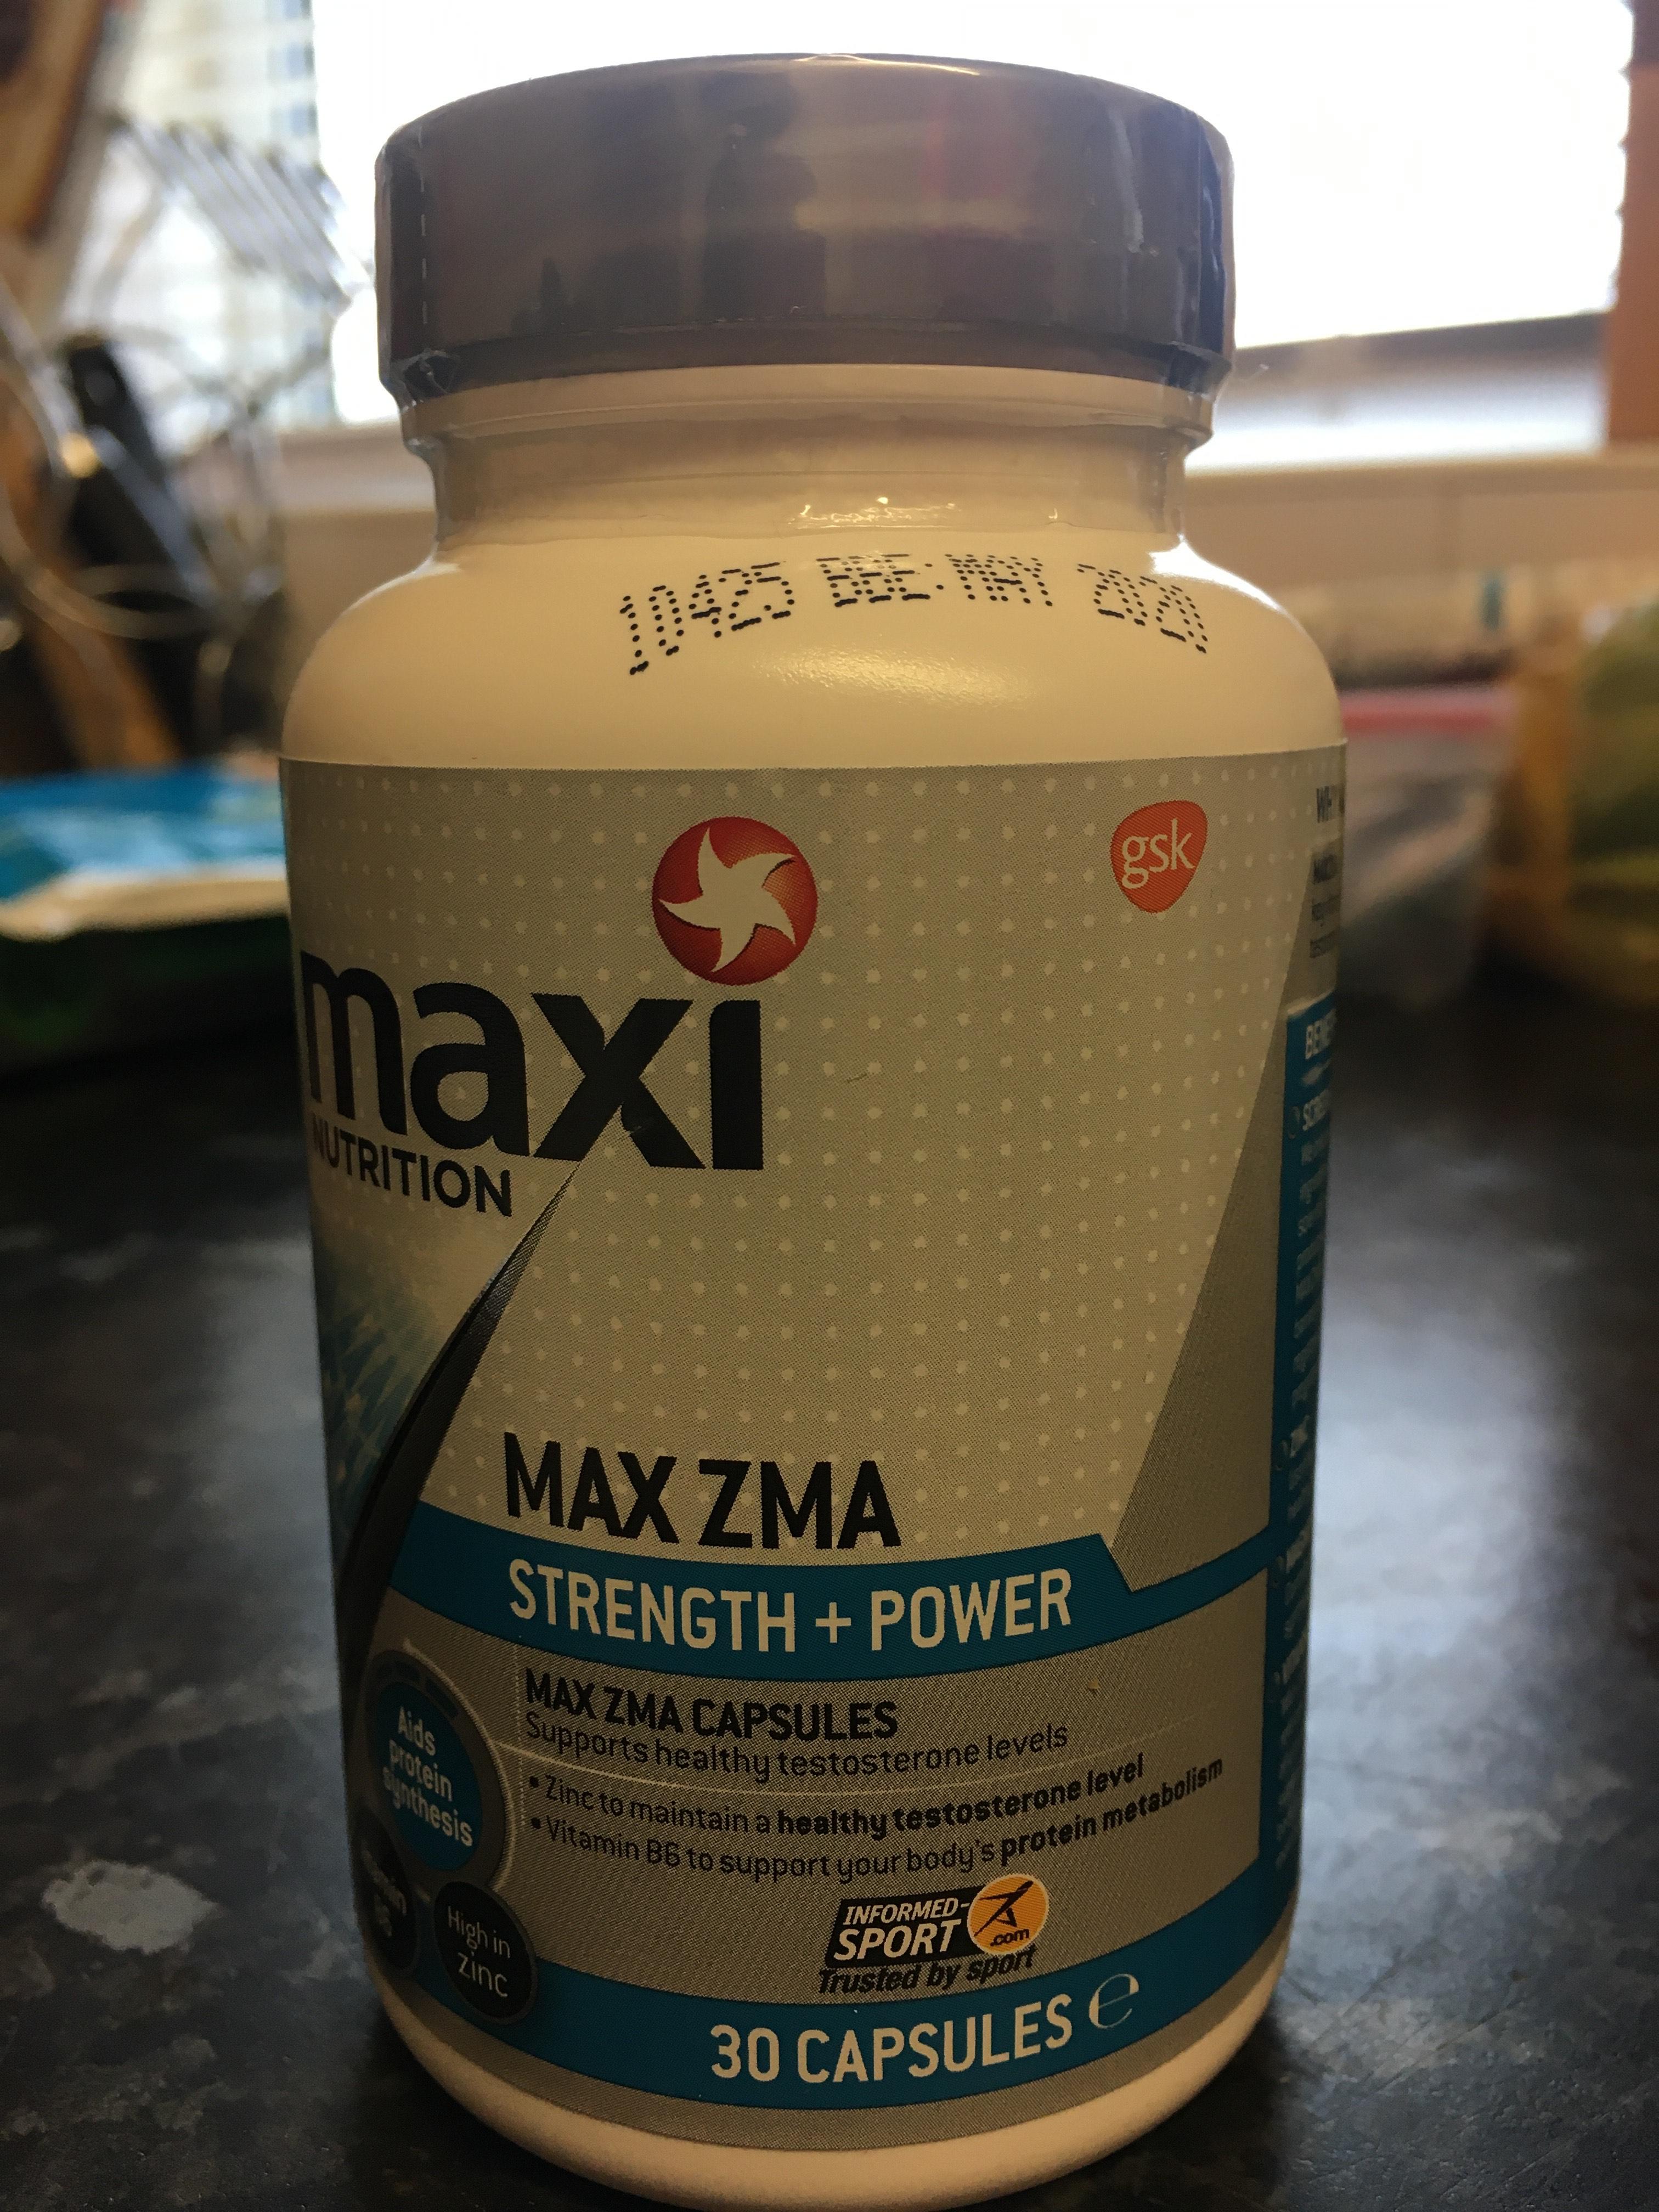 Maxi Nutrition Max zma £1.99 at Caernarfon Home Bargains